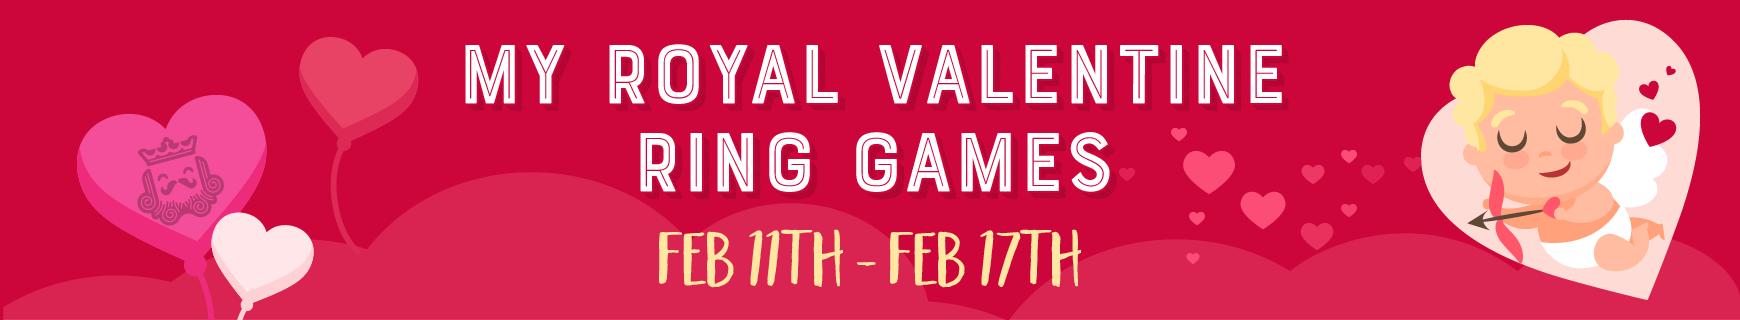 My royal valentine ring games %28870 x 160%29 2x